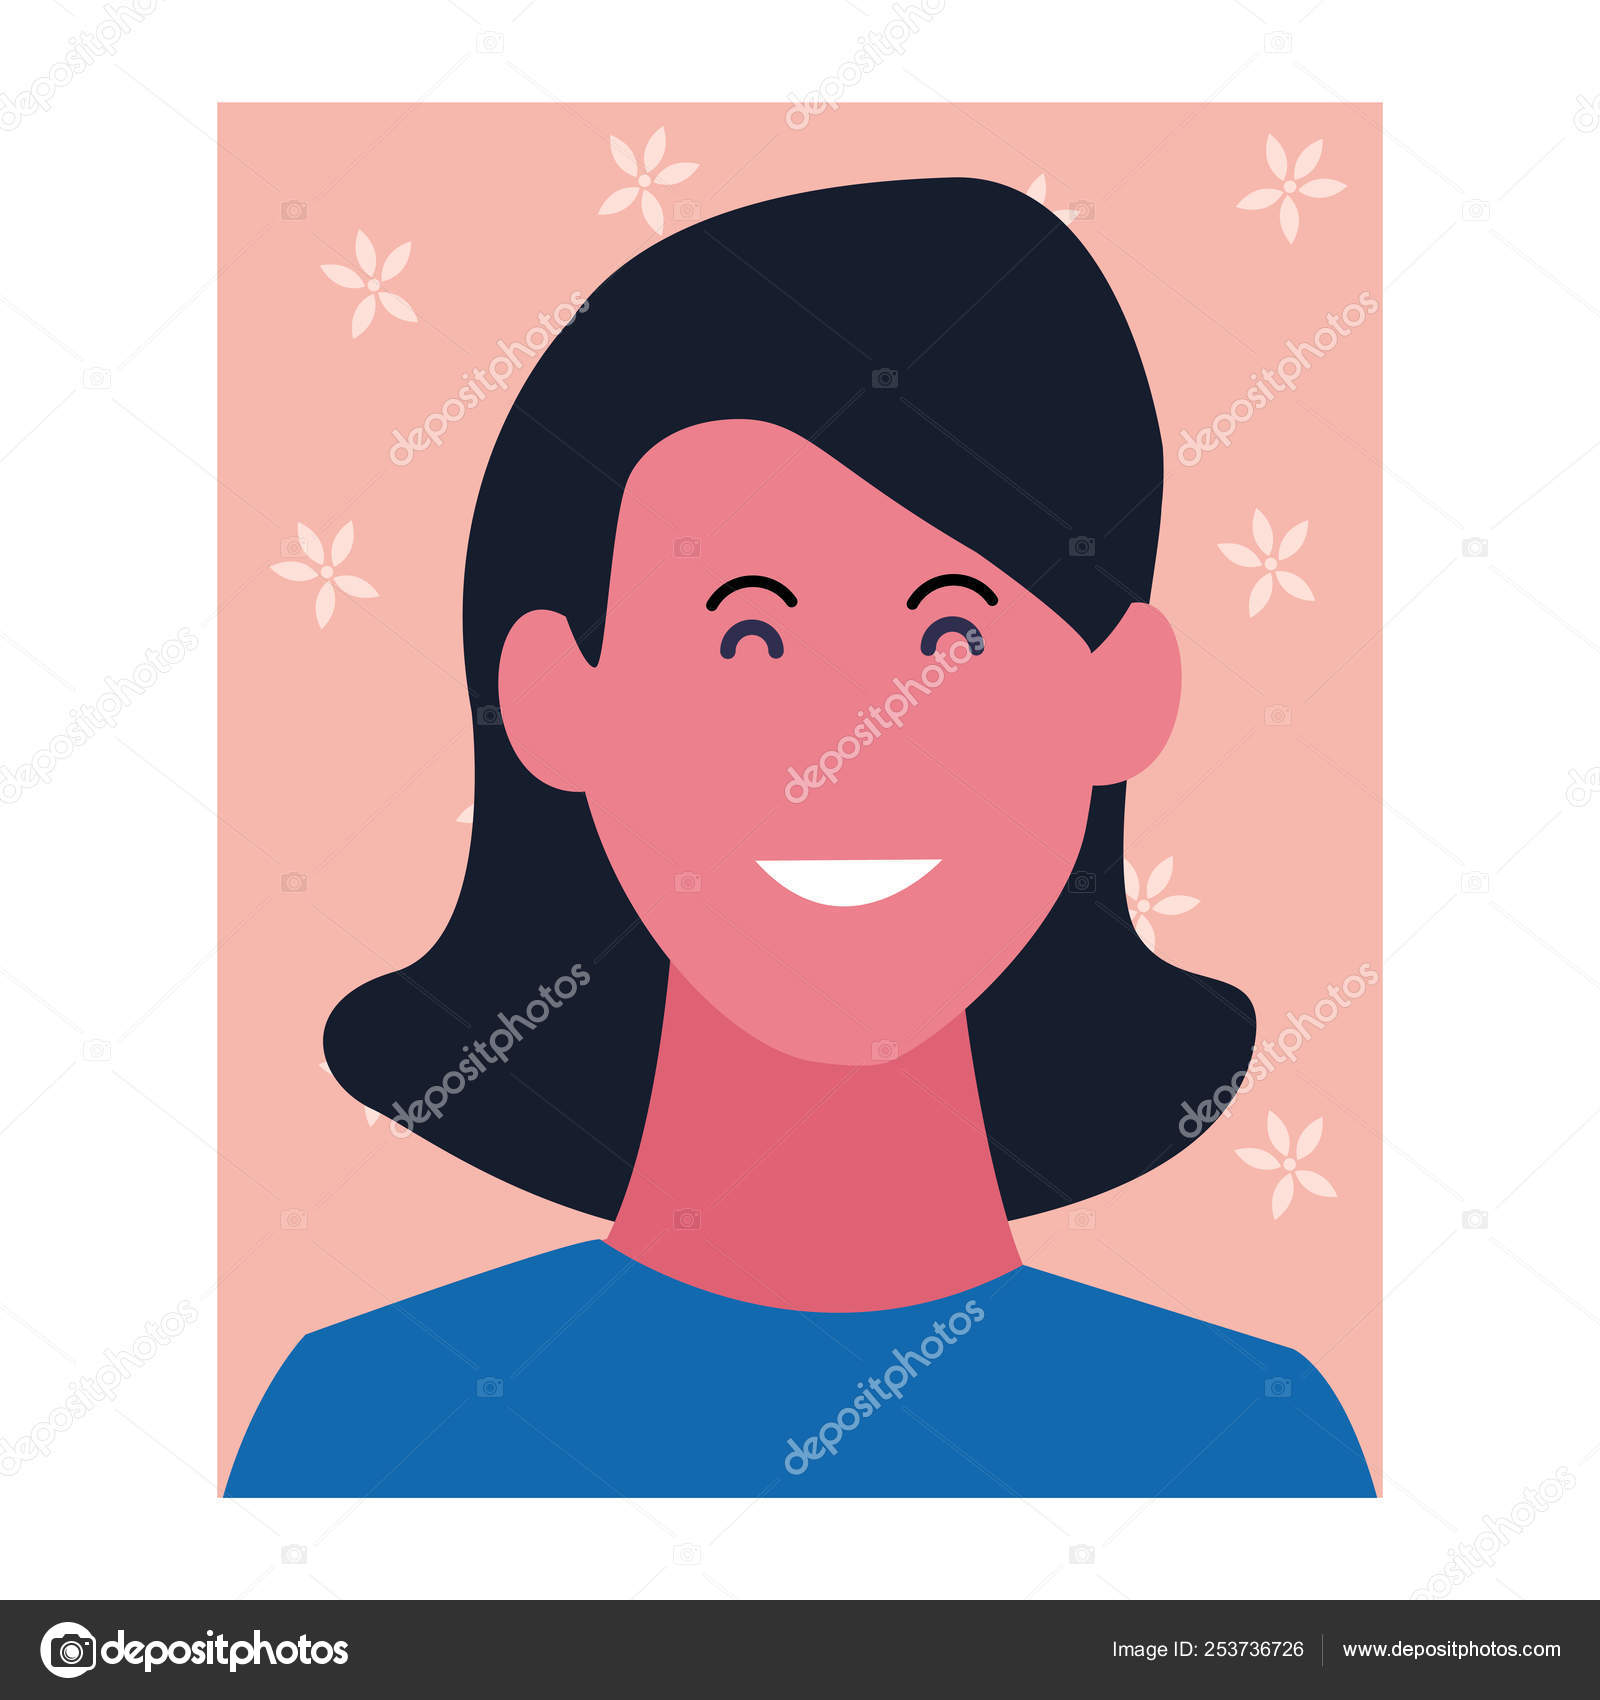 Woman Smiling Cartoon Profile Stock Vector C Jemastock 253736726